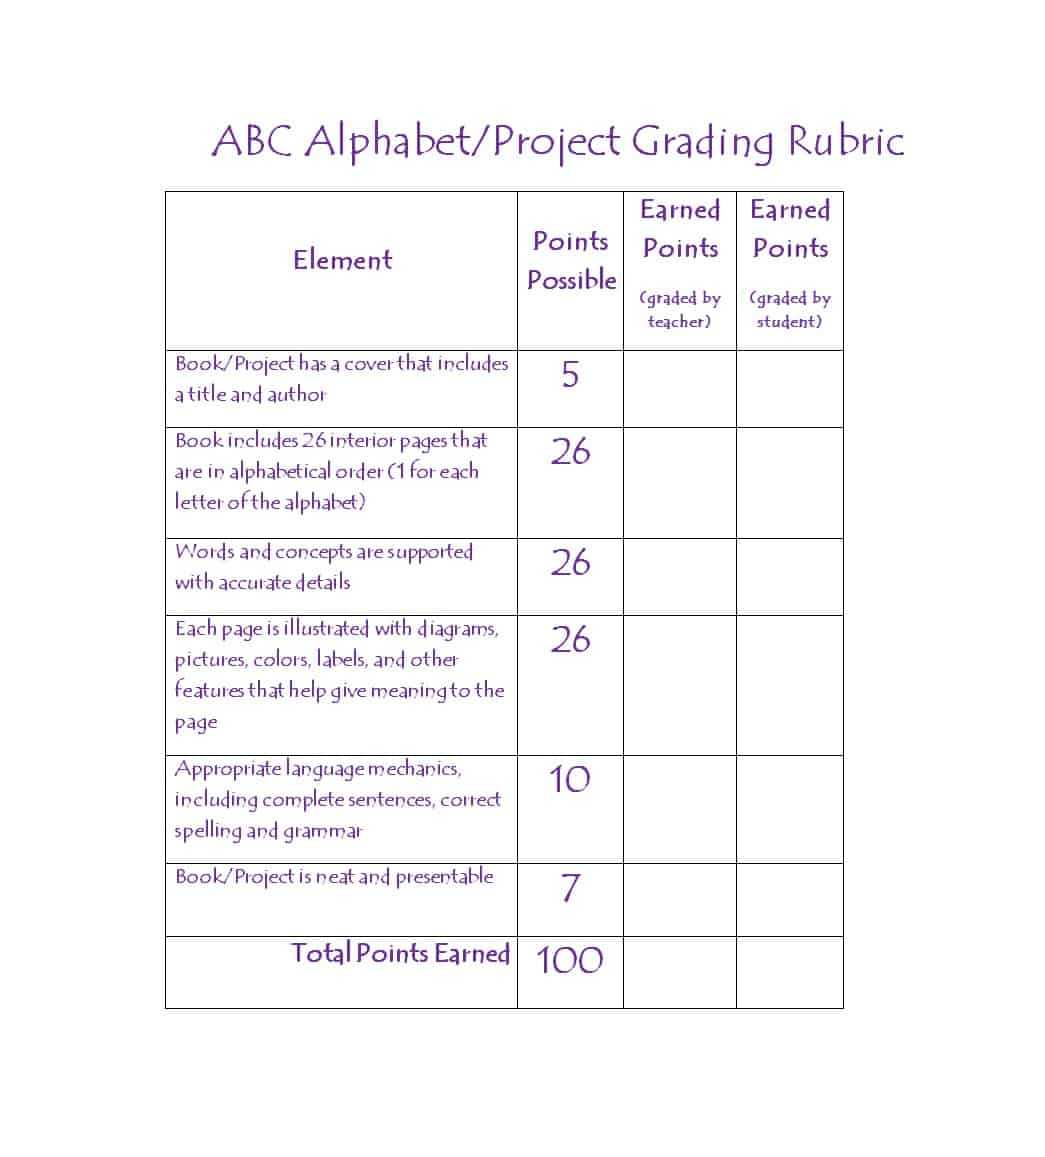 46 Editable Rubric Templates (Word Format) ᐅ Template Lab With Grading Rubric Template Word